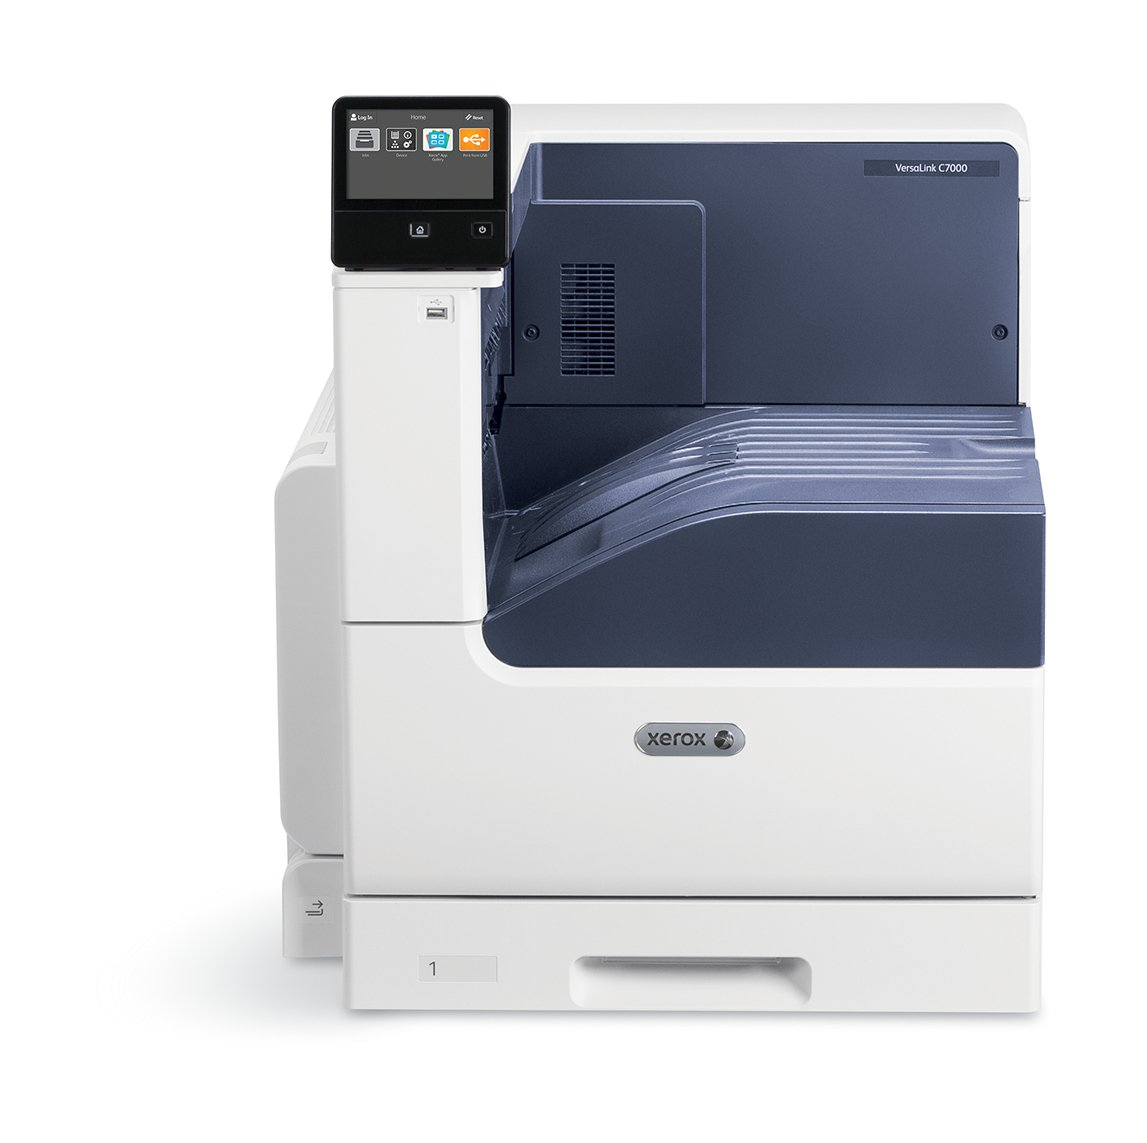 Xerox VersaLink C7000/DN Color Printer, Amazon Dash Replenishment Ready